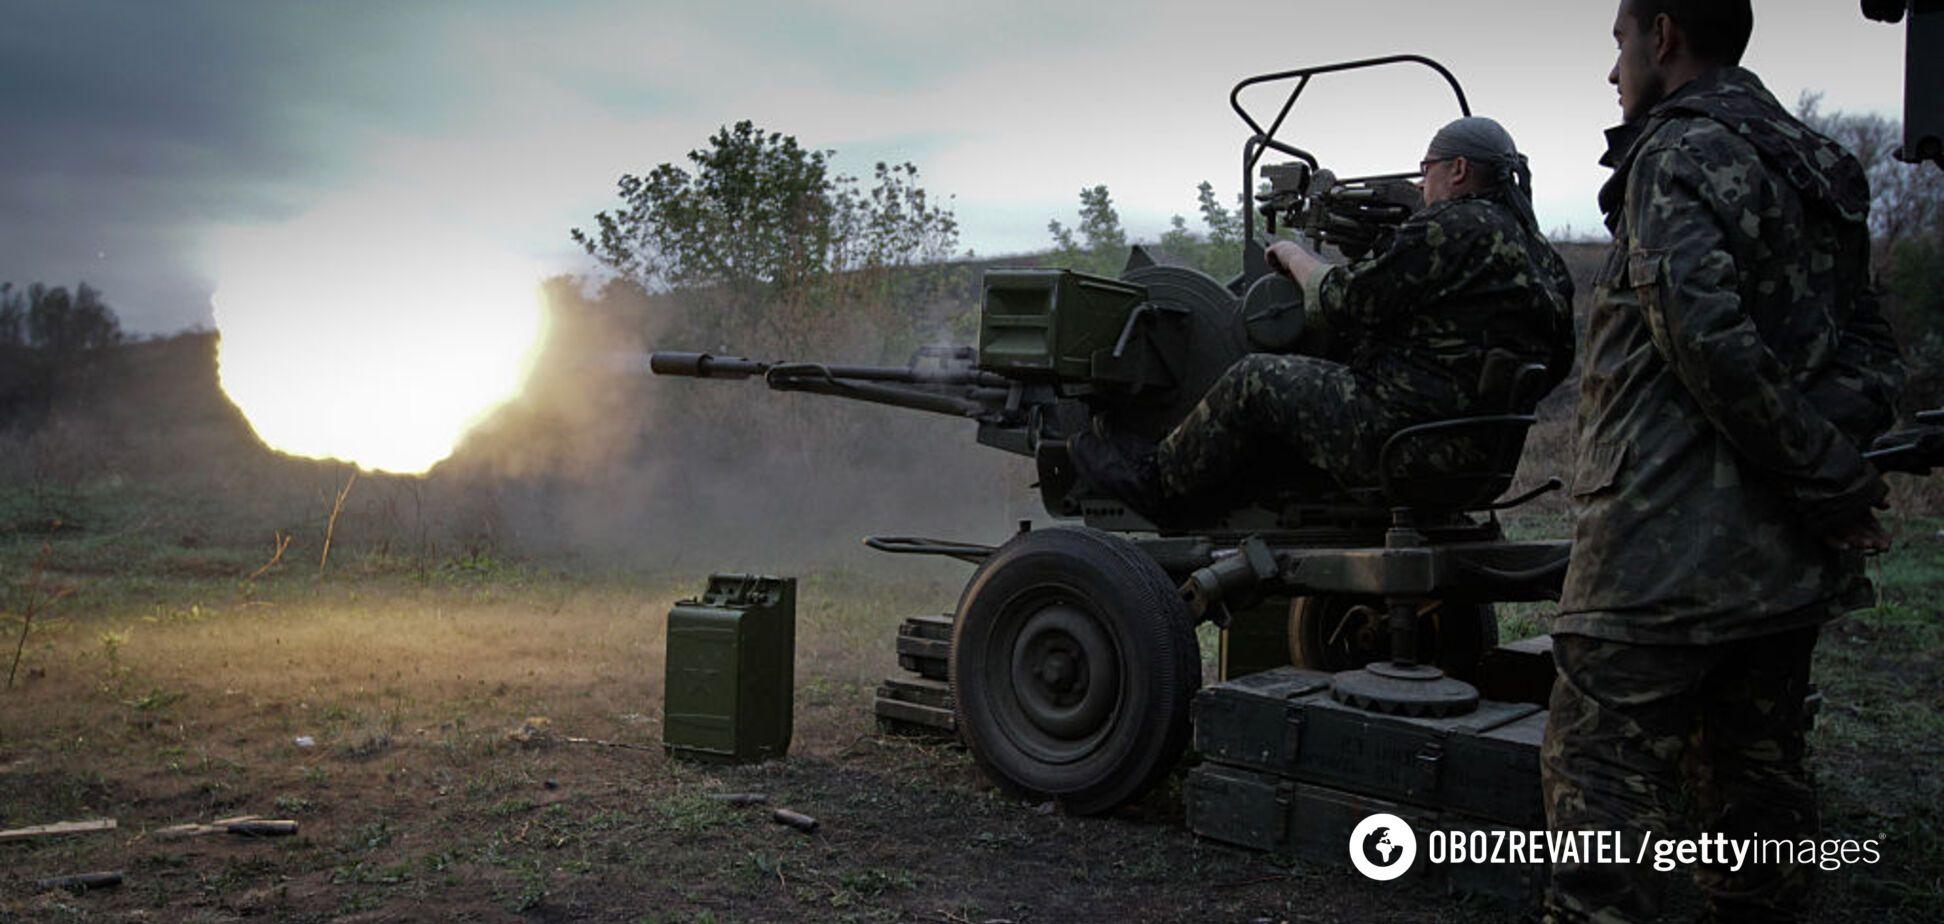 Терористи Путіна влаштували криваву розправу над ЗСУ: Україна зазнала важких втрат